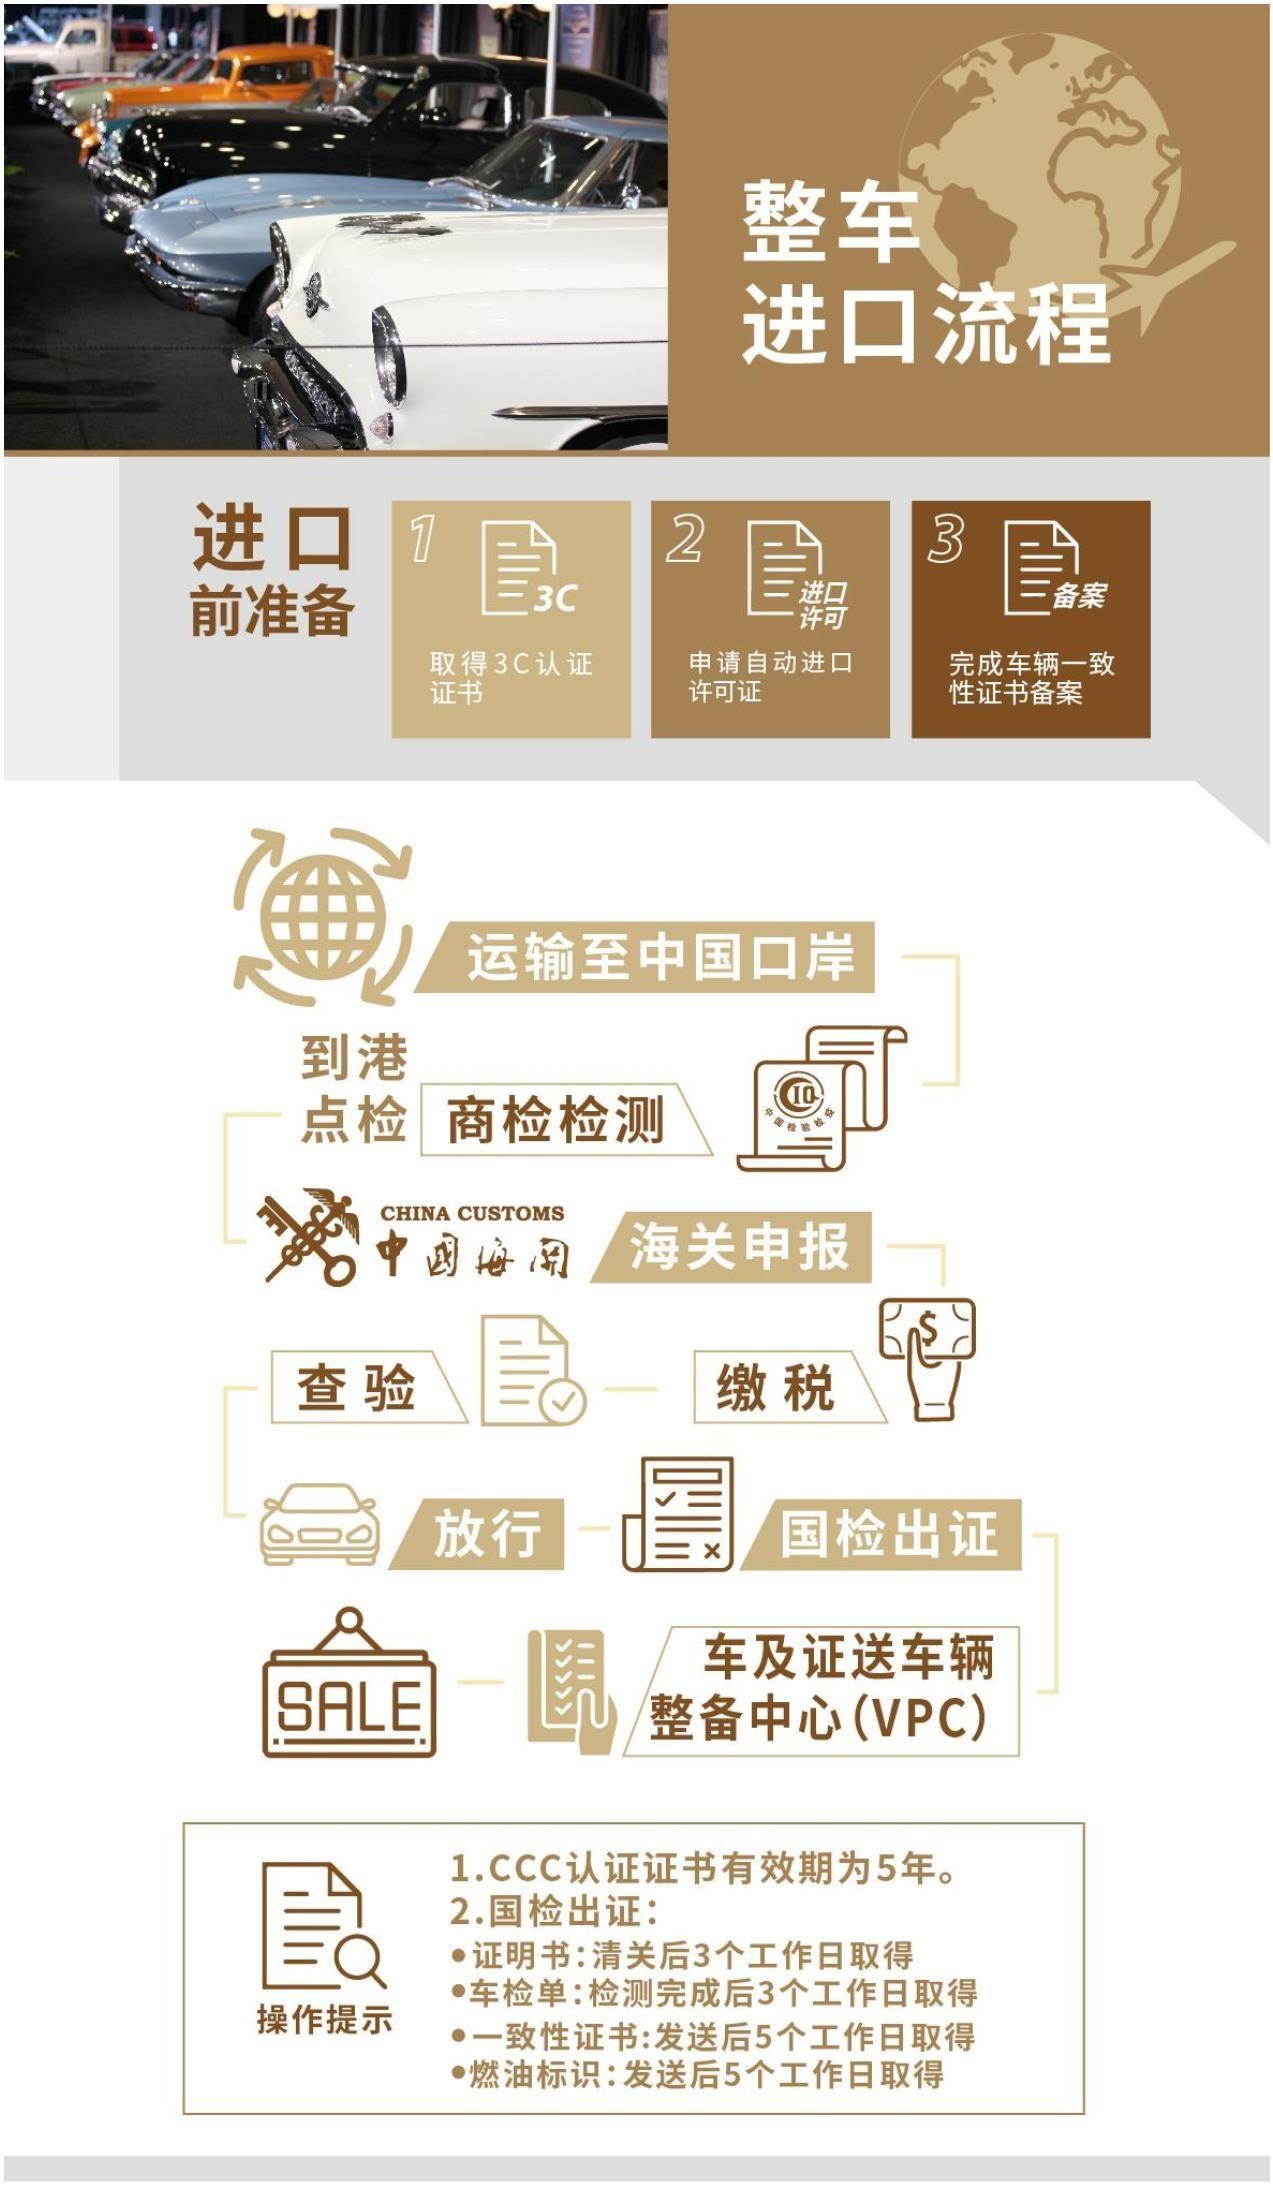 International Vehicle Importers >> Whole Vehicle Import Process Automobiles China